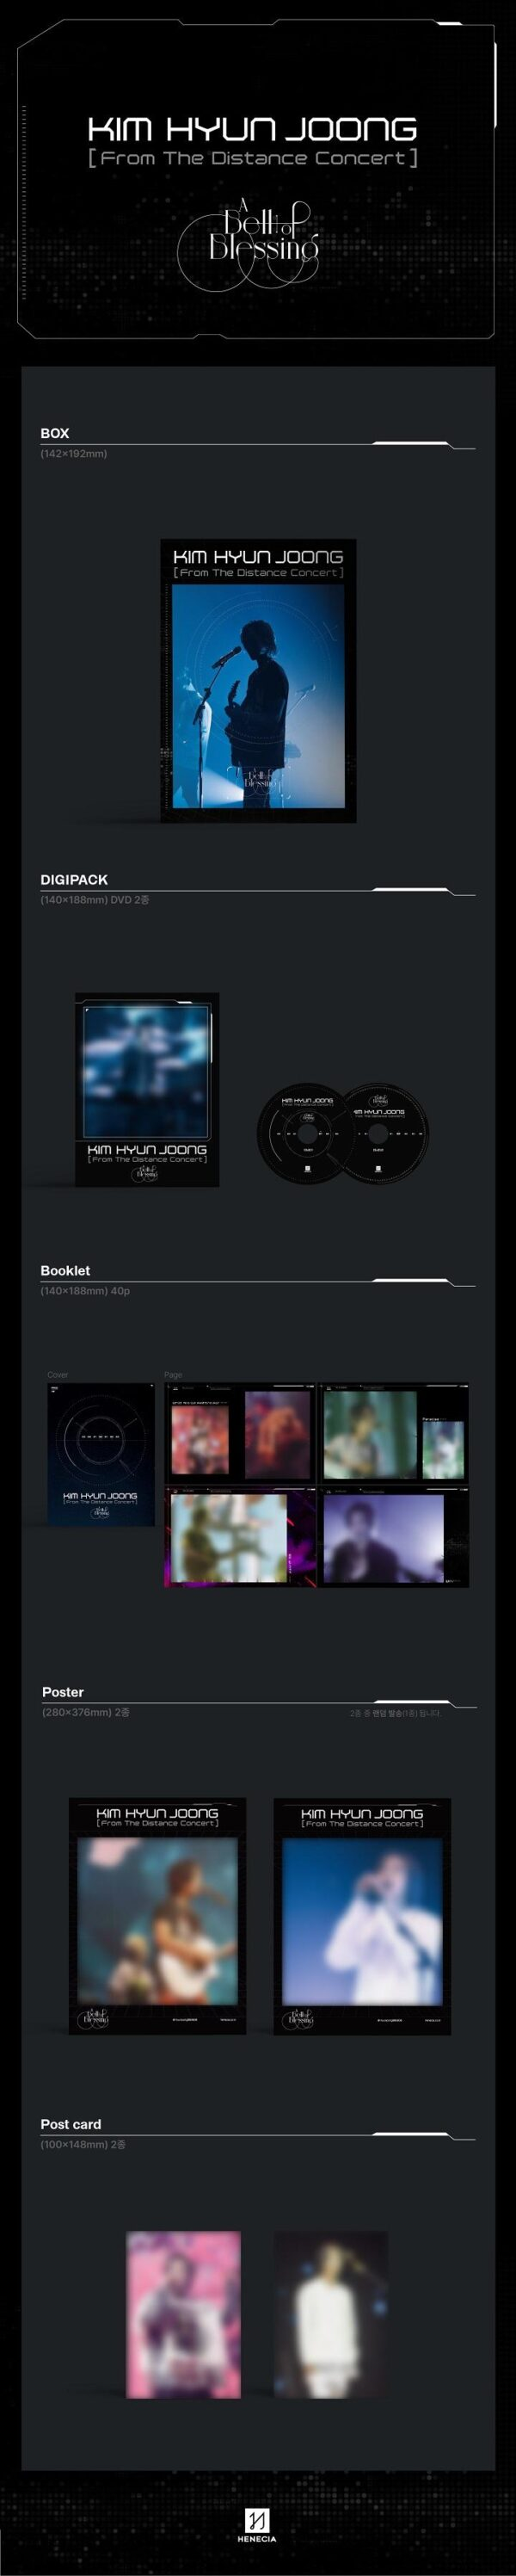 Kim Hyun Joong From The Distance Concert DVD 1